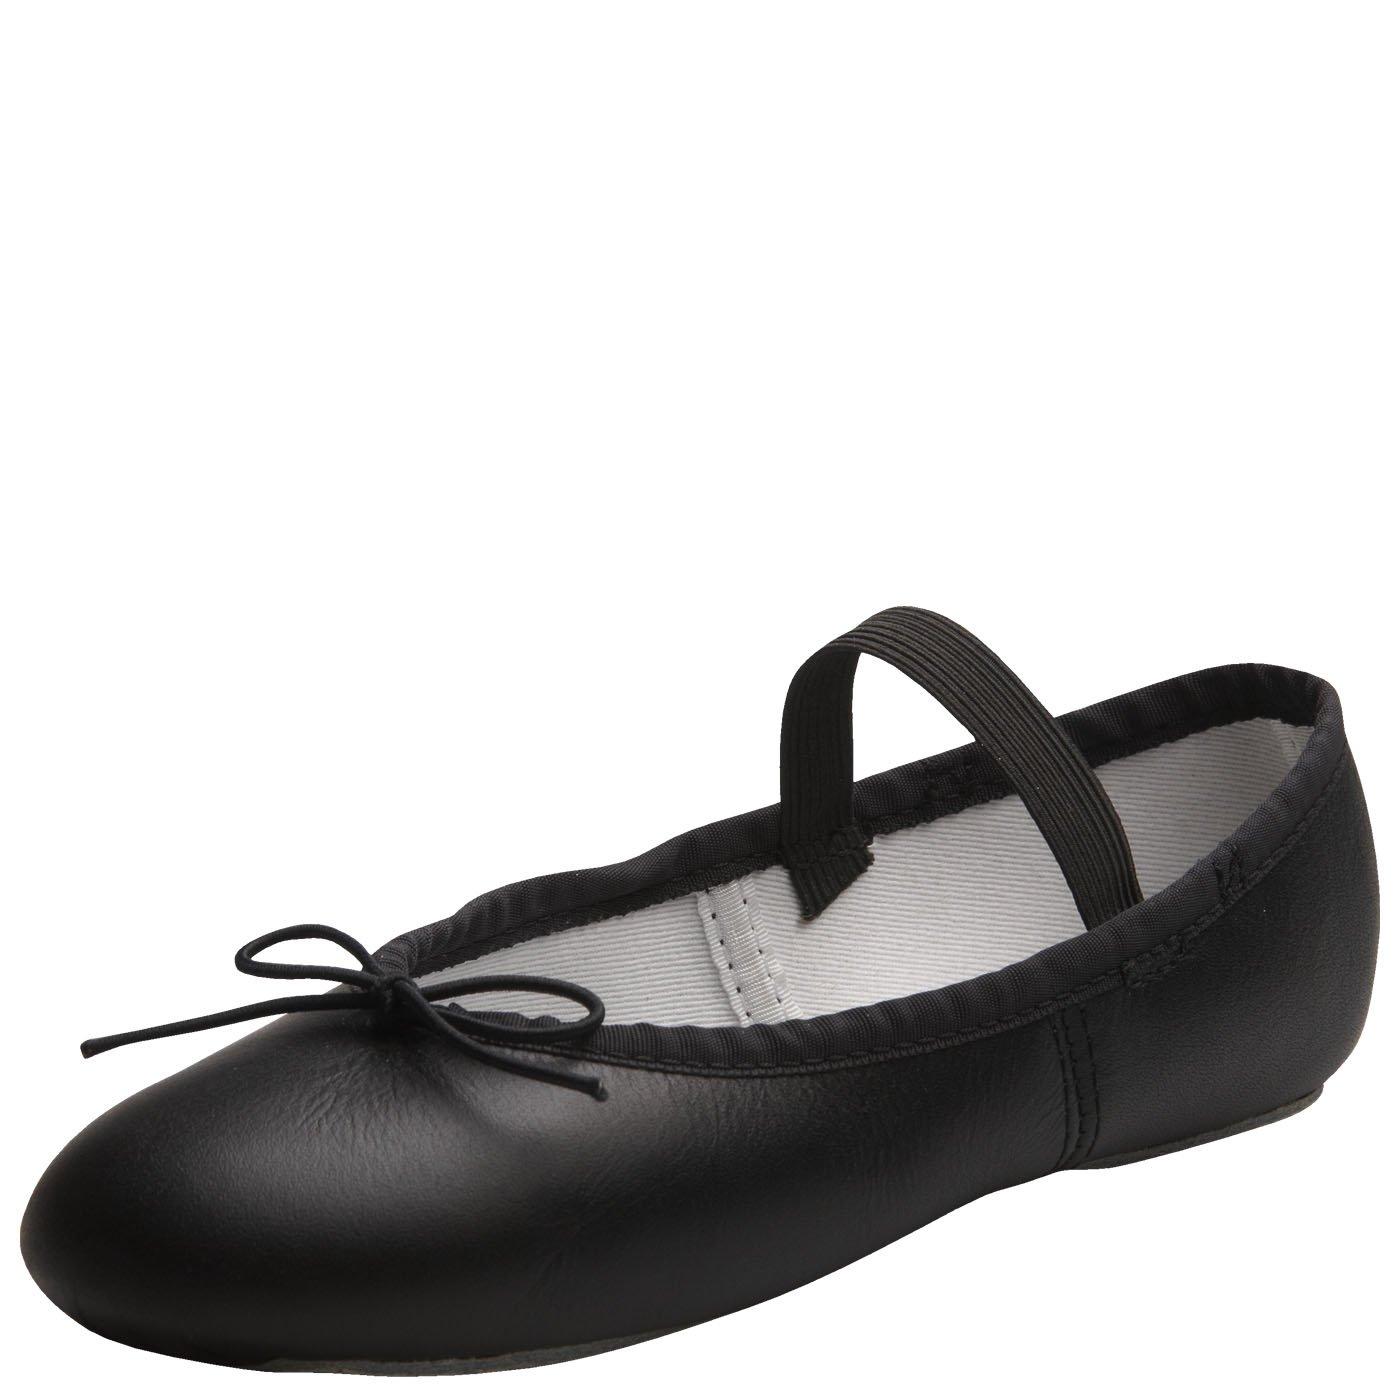 American Ballet Theatre For Spotlights Girl's Ballet Shoe Black 8